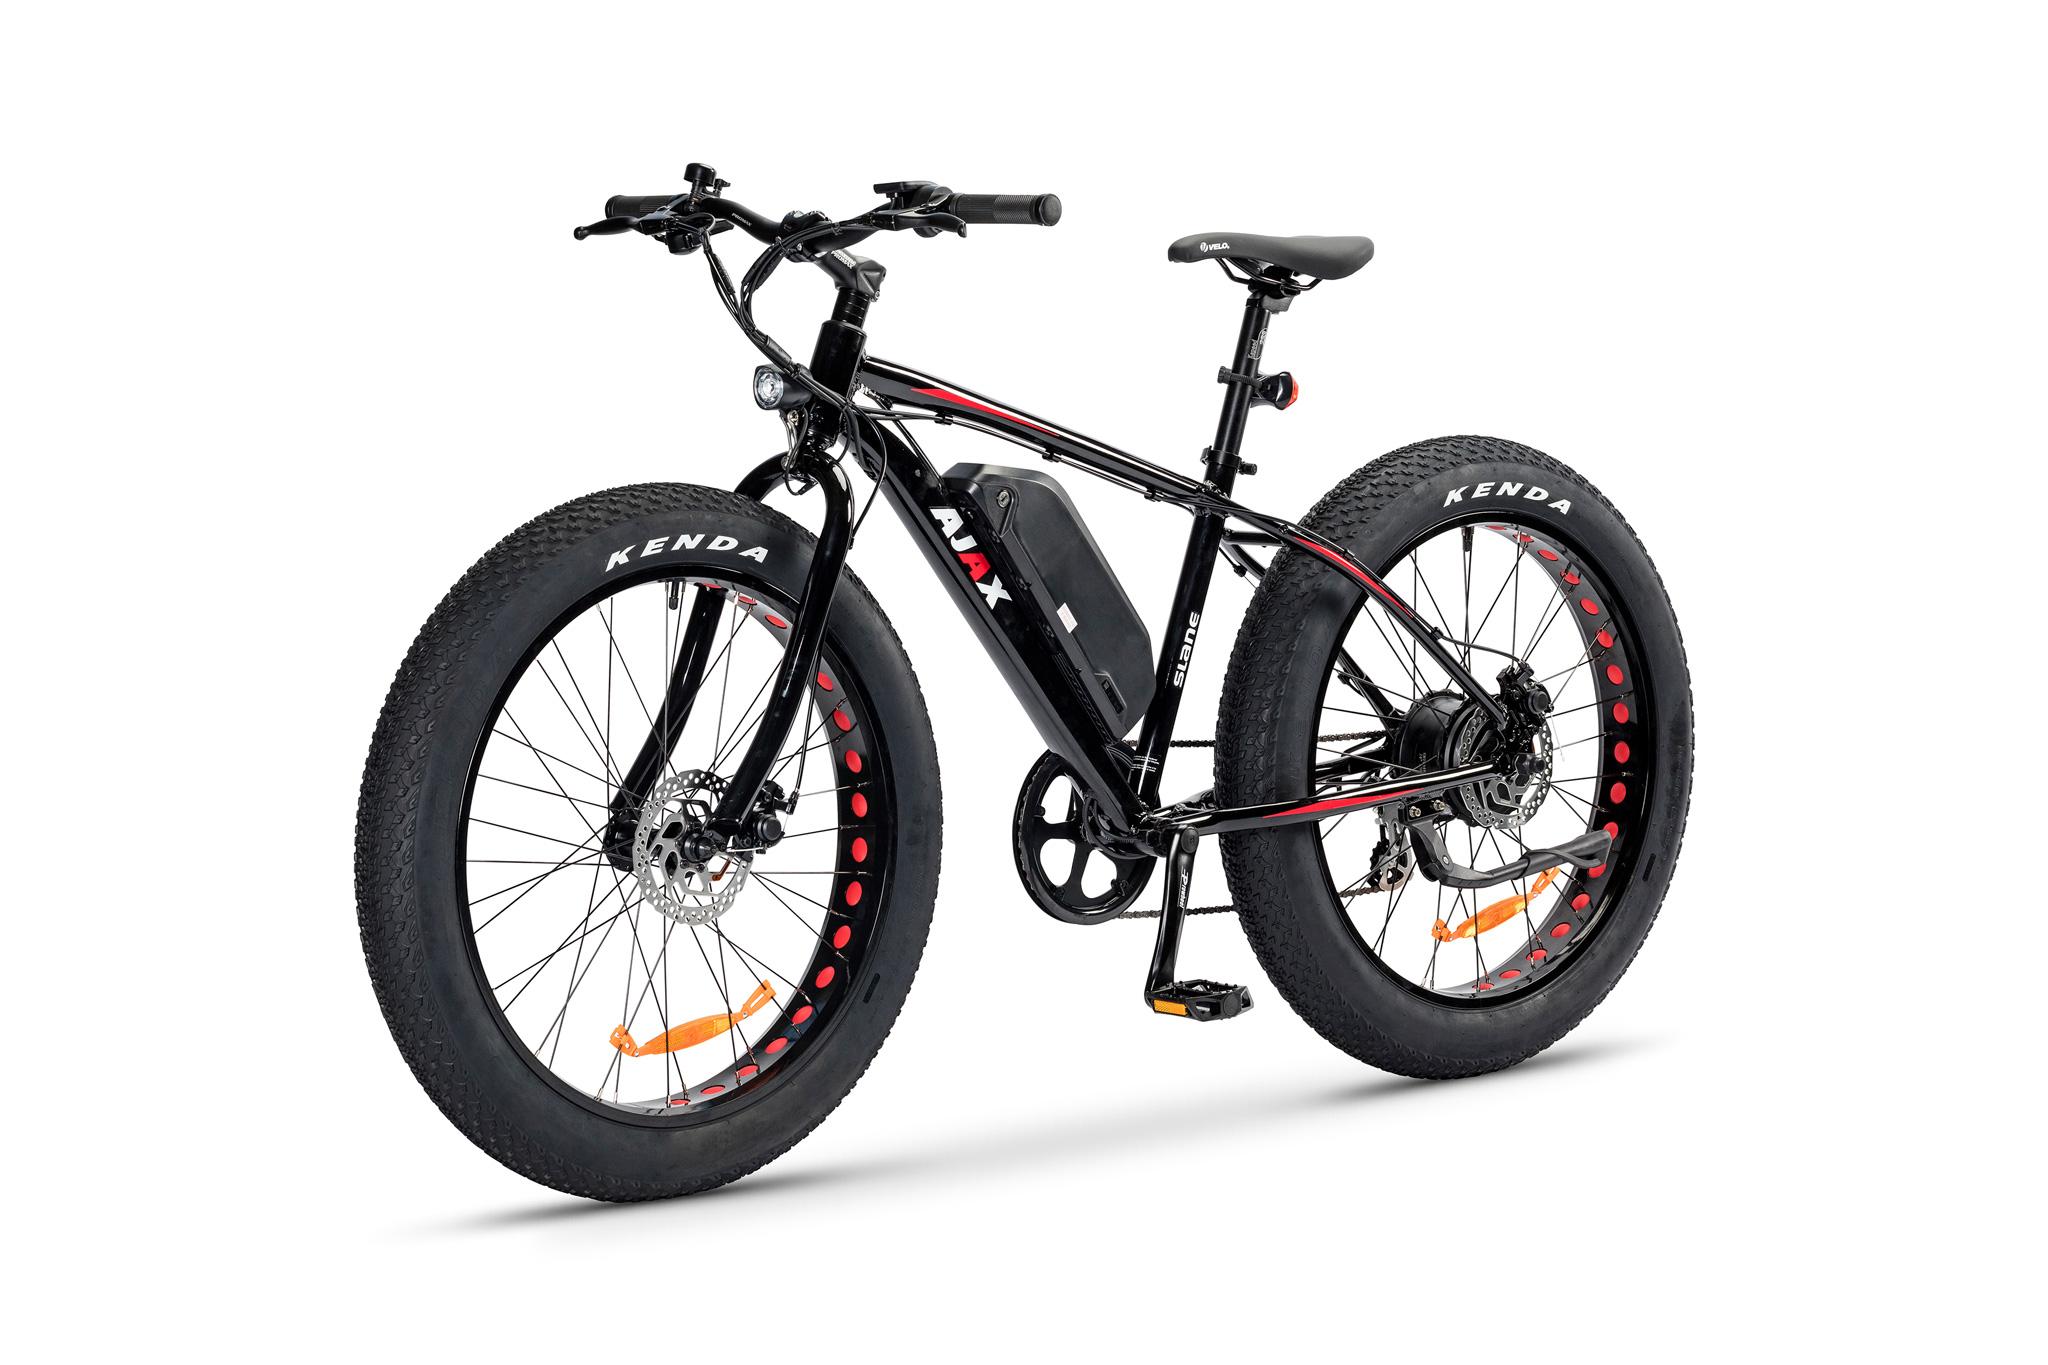 The Slane Ajax Fat Tire